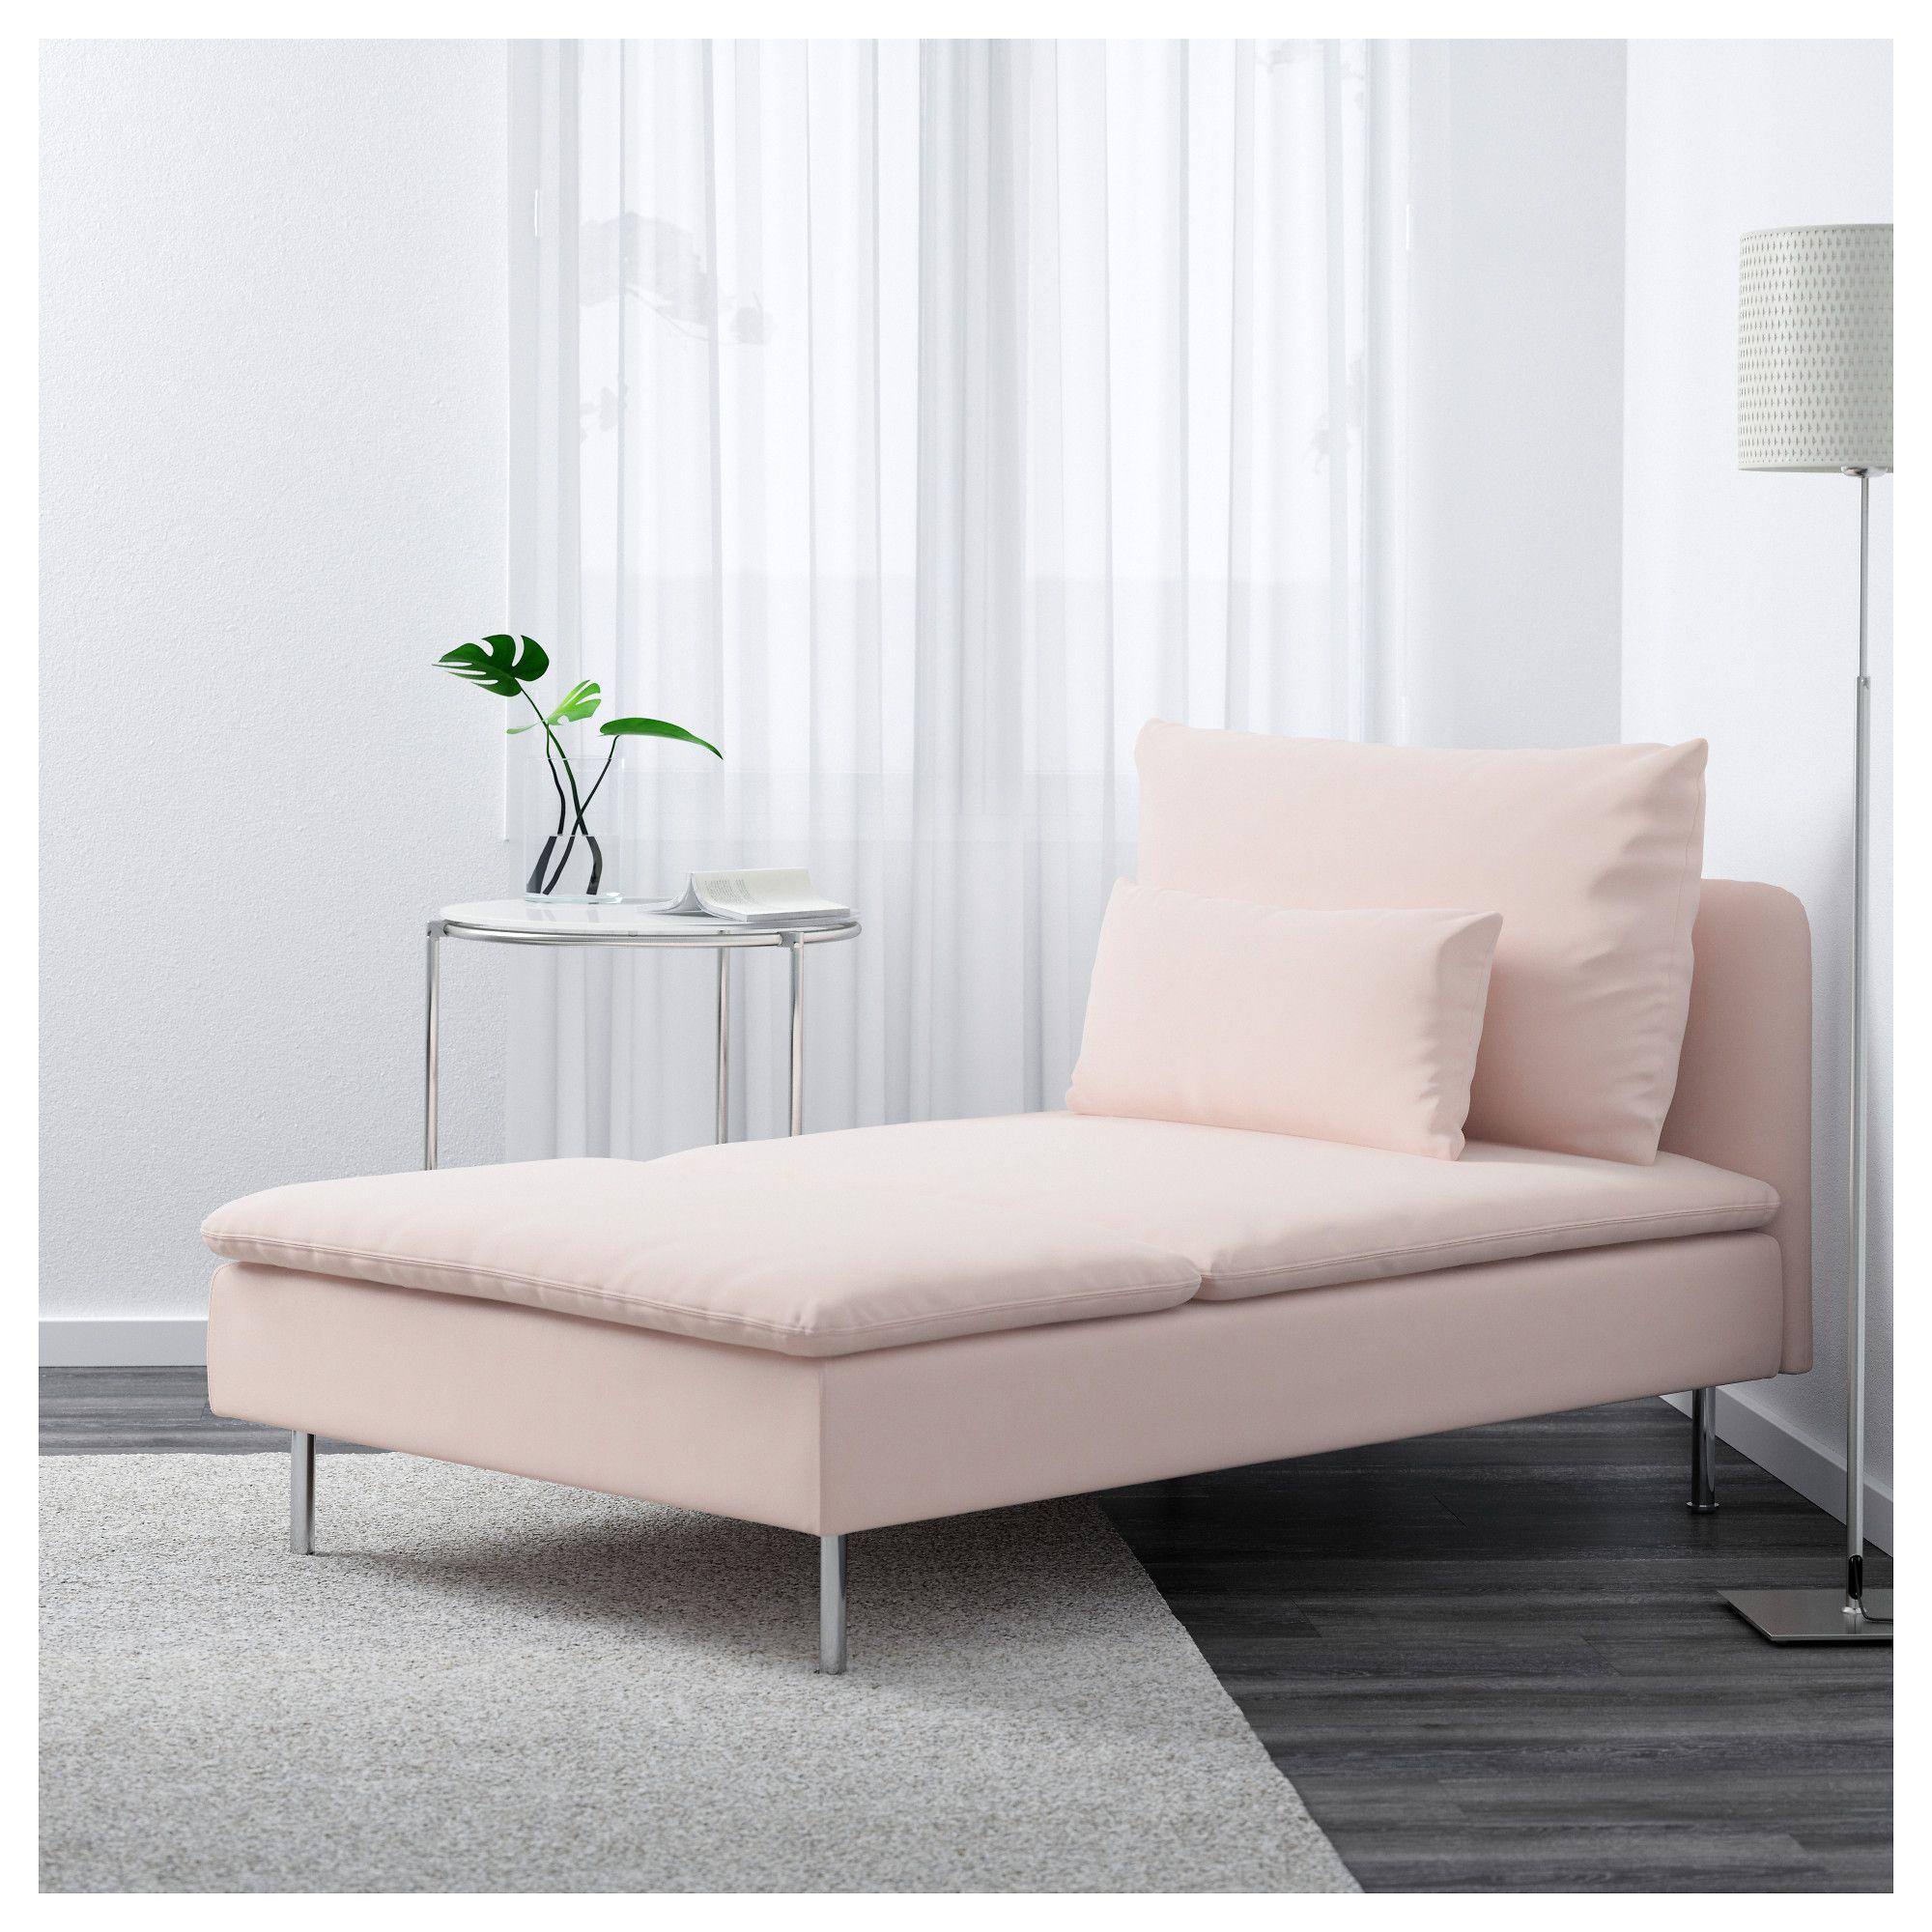 SÖDERHAMN Chaise - Samsta light pink | Chaise longue, Sofa ...